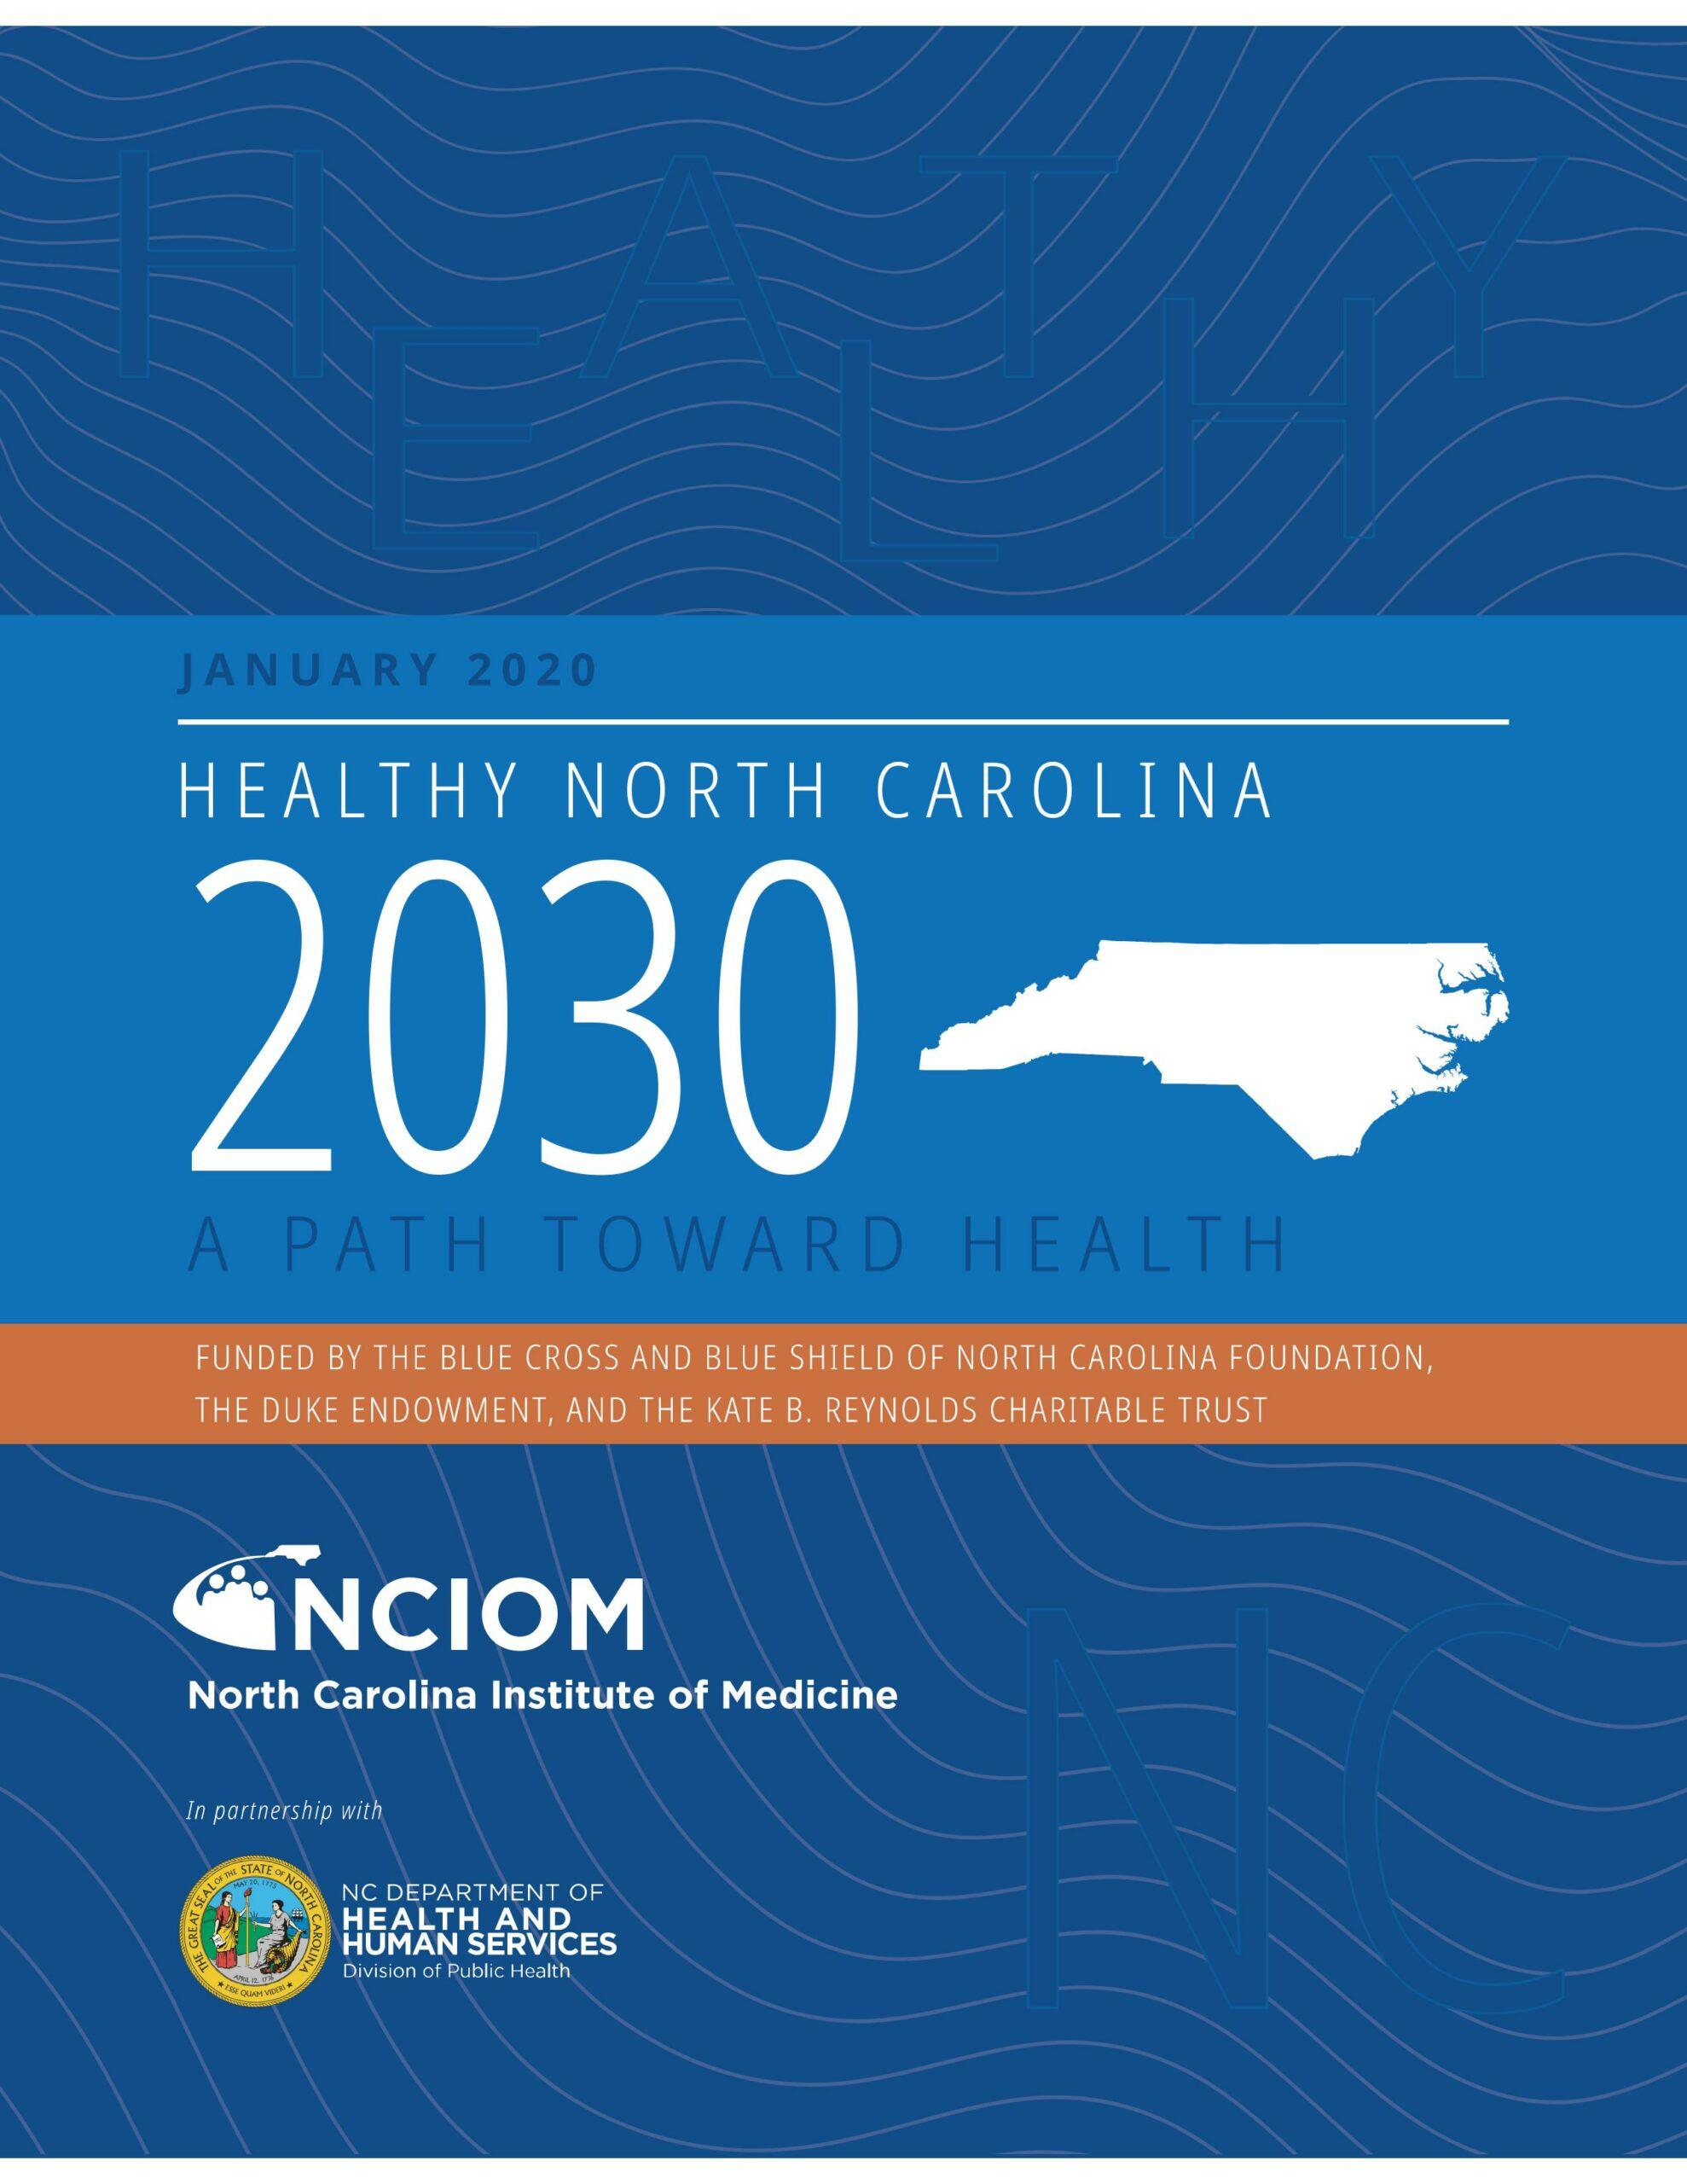 Healthy North Carolina 2030: A Path Toward Health